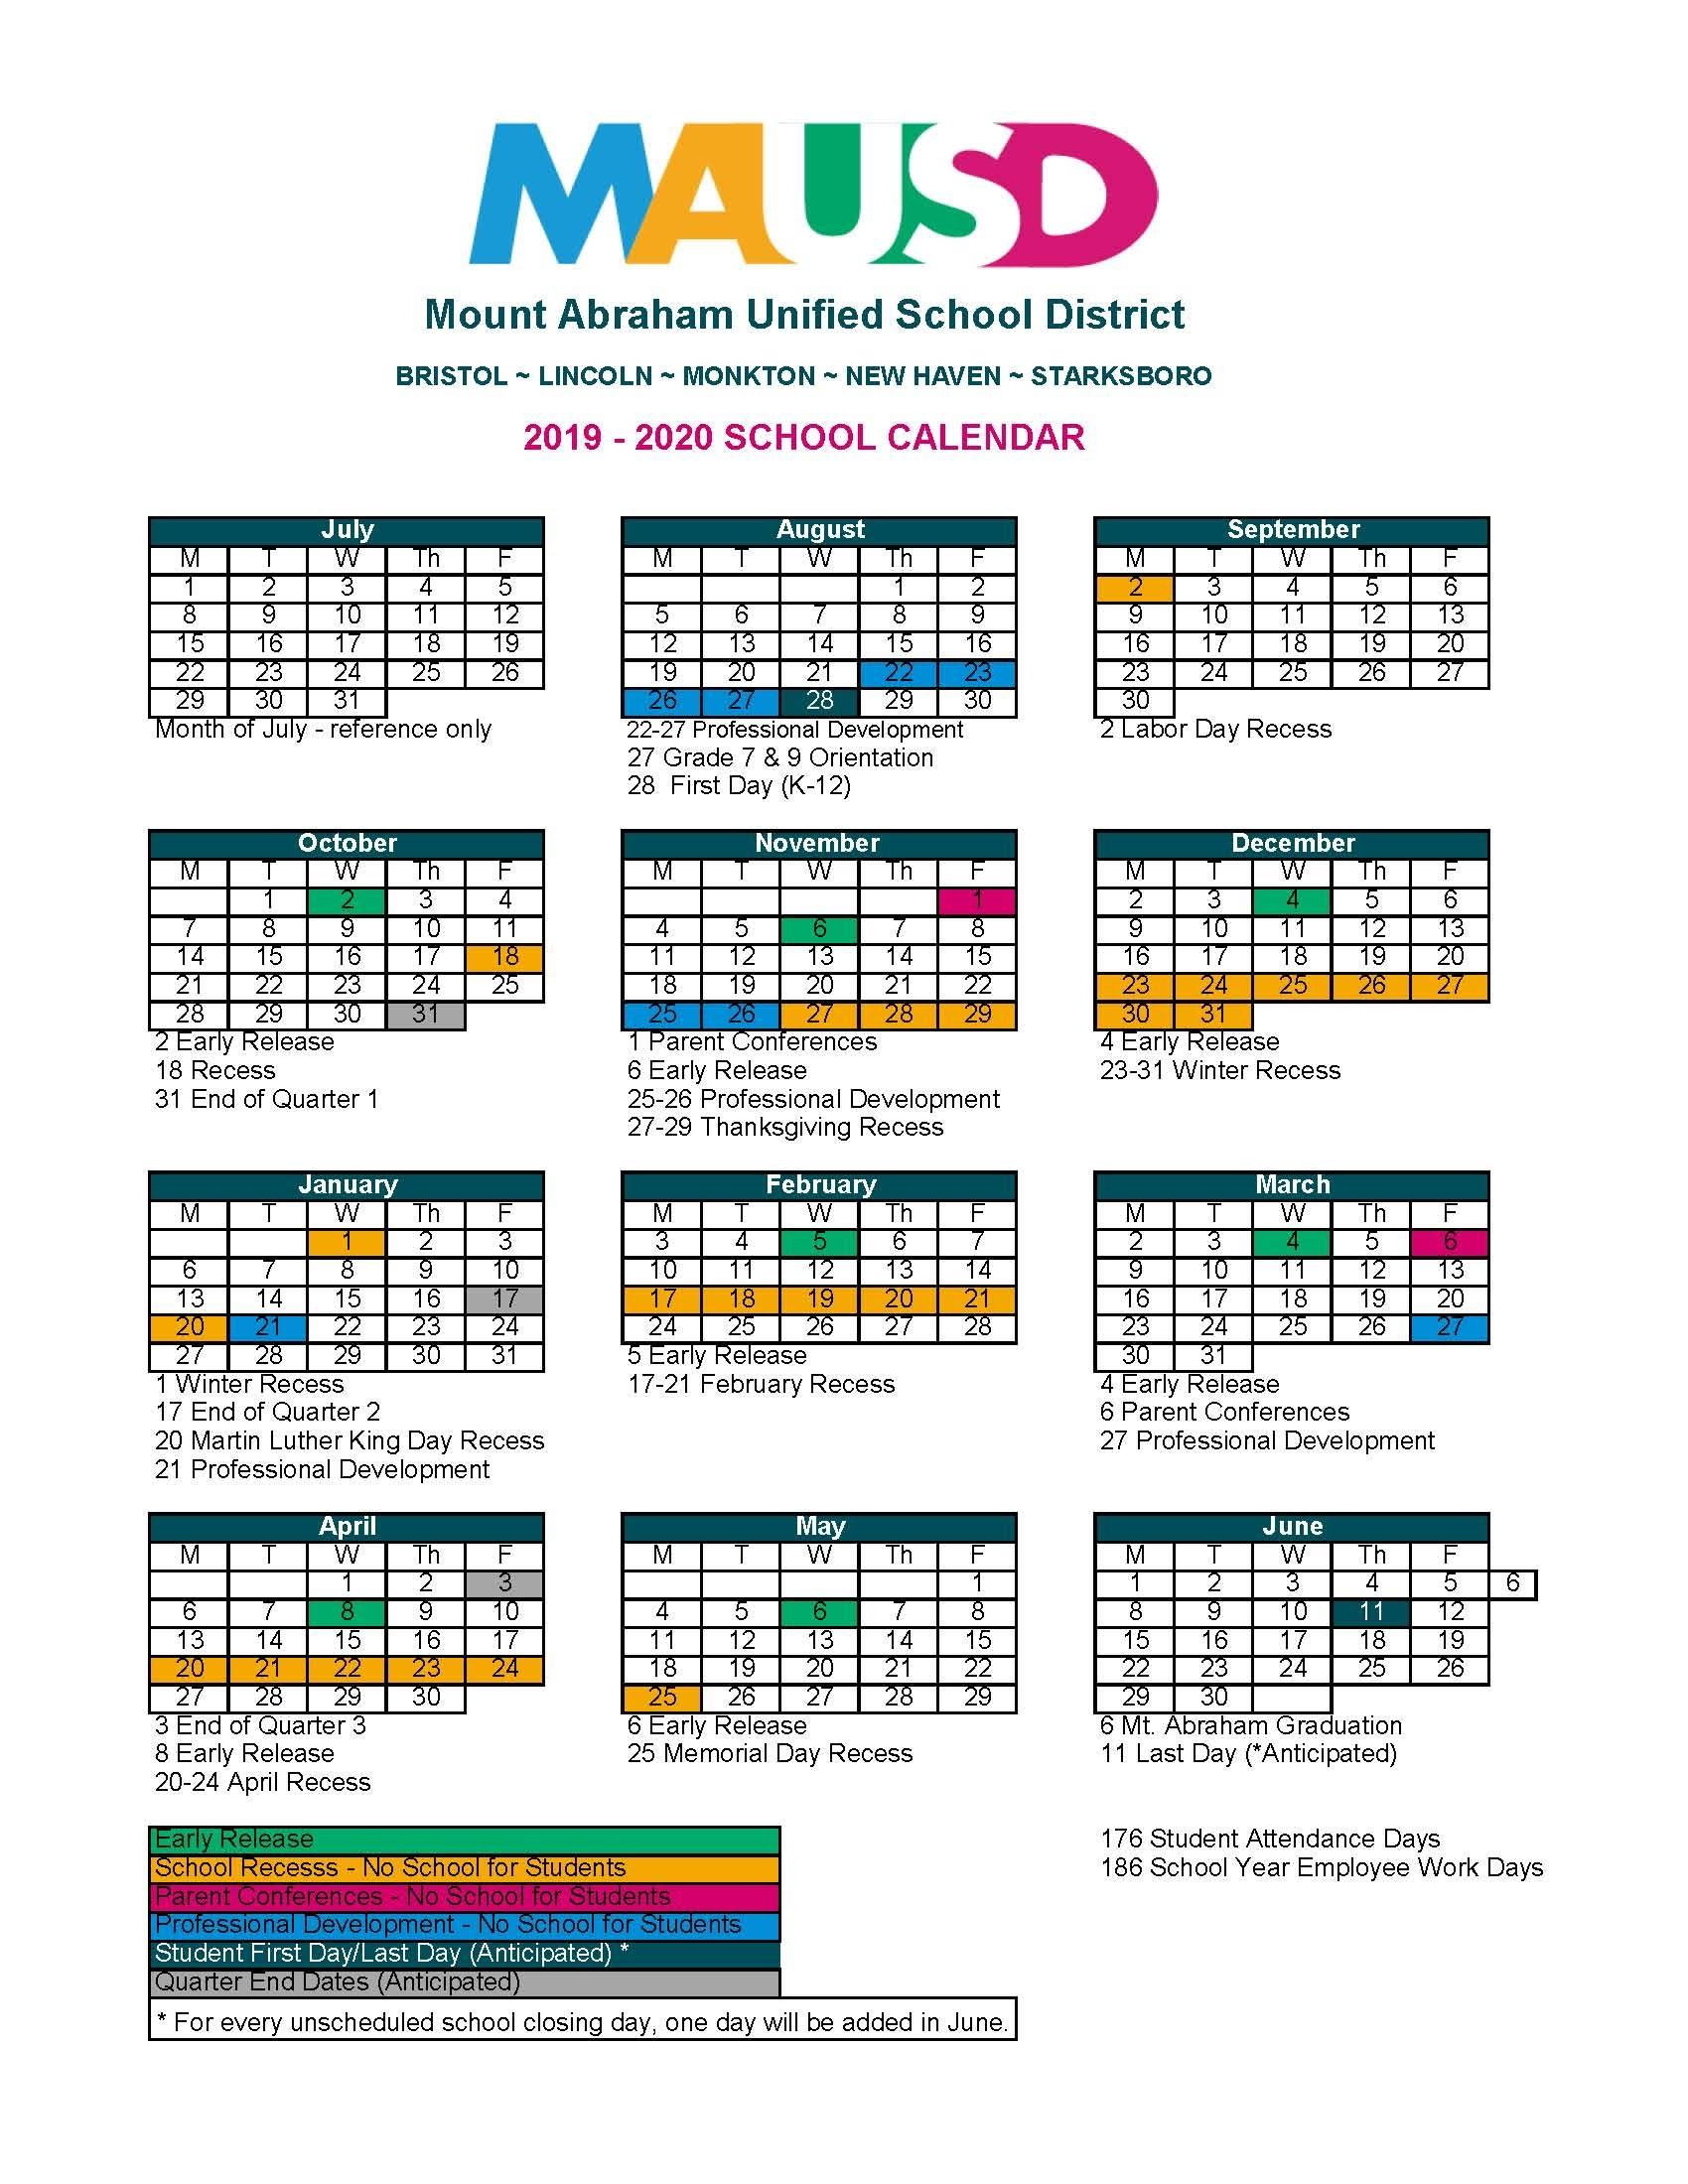 School Calendar - Mausd In Lincoln Unified School District Calendar 2021